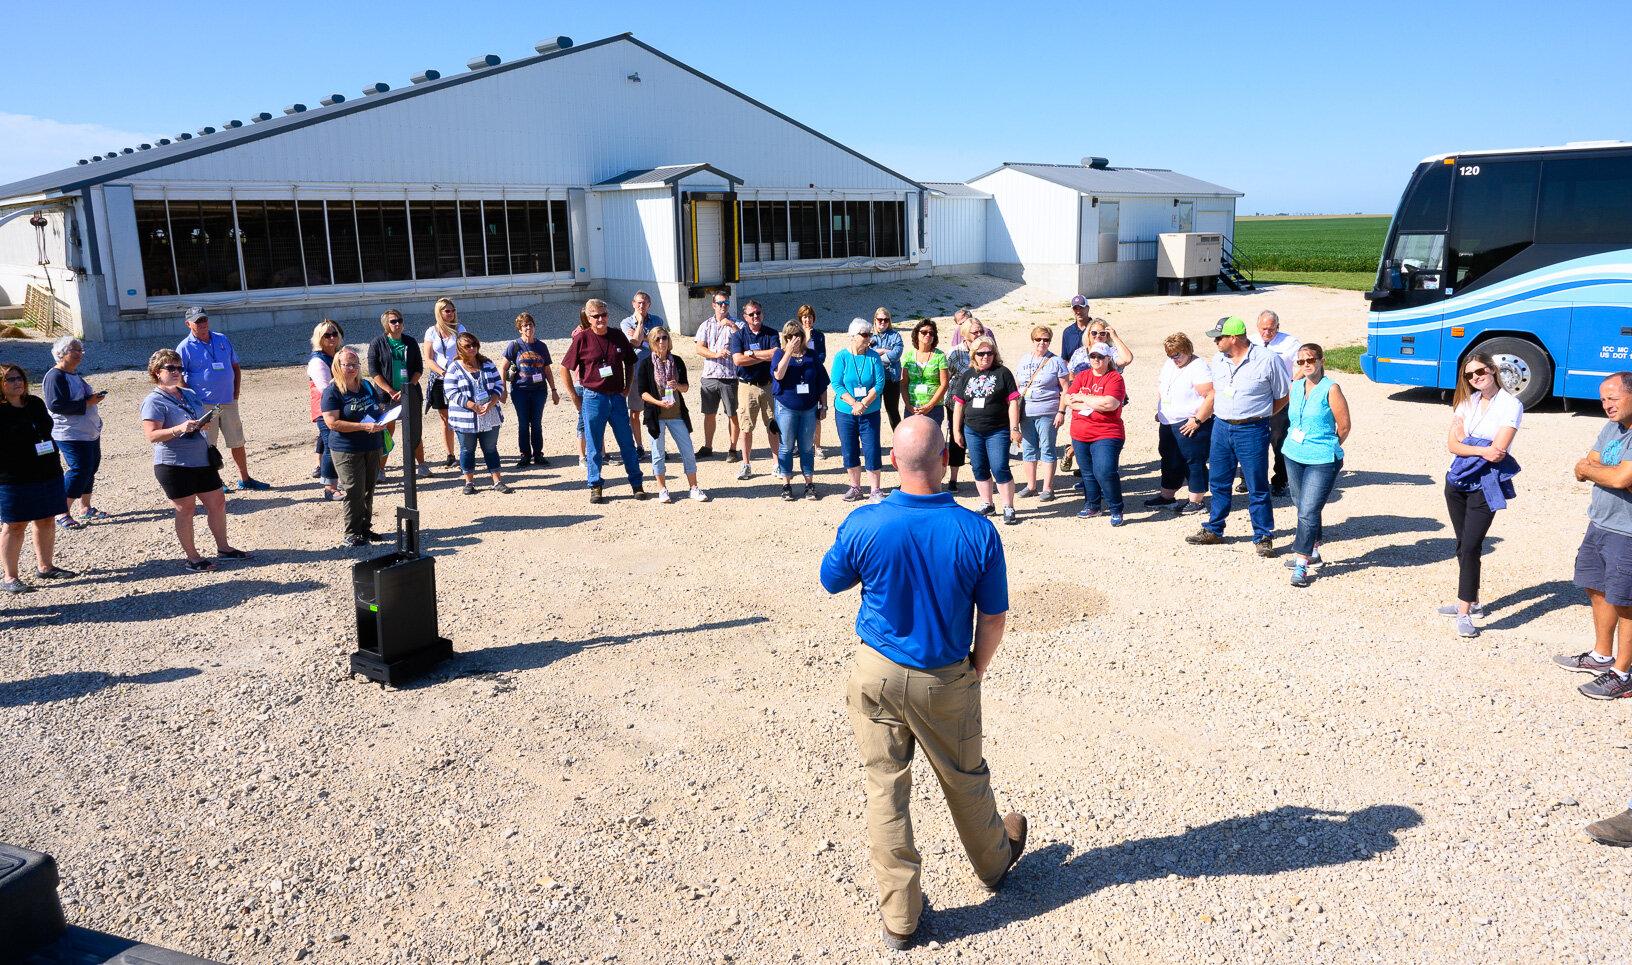 Jonathan Wetter welcomes participants to his farm. He explains how he raises pigs in a modern 2,400-head barn. Photo credit: Joseph L. Murphy/Iowa Soybean Association